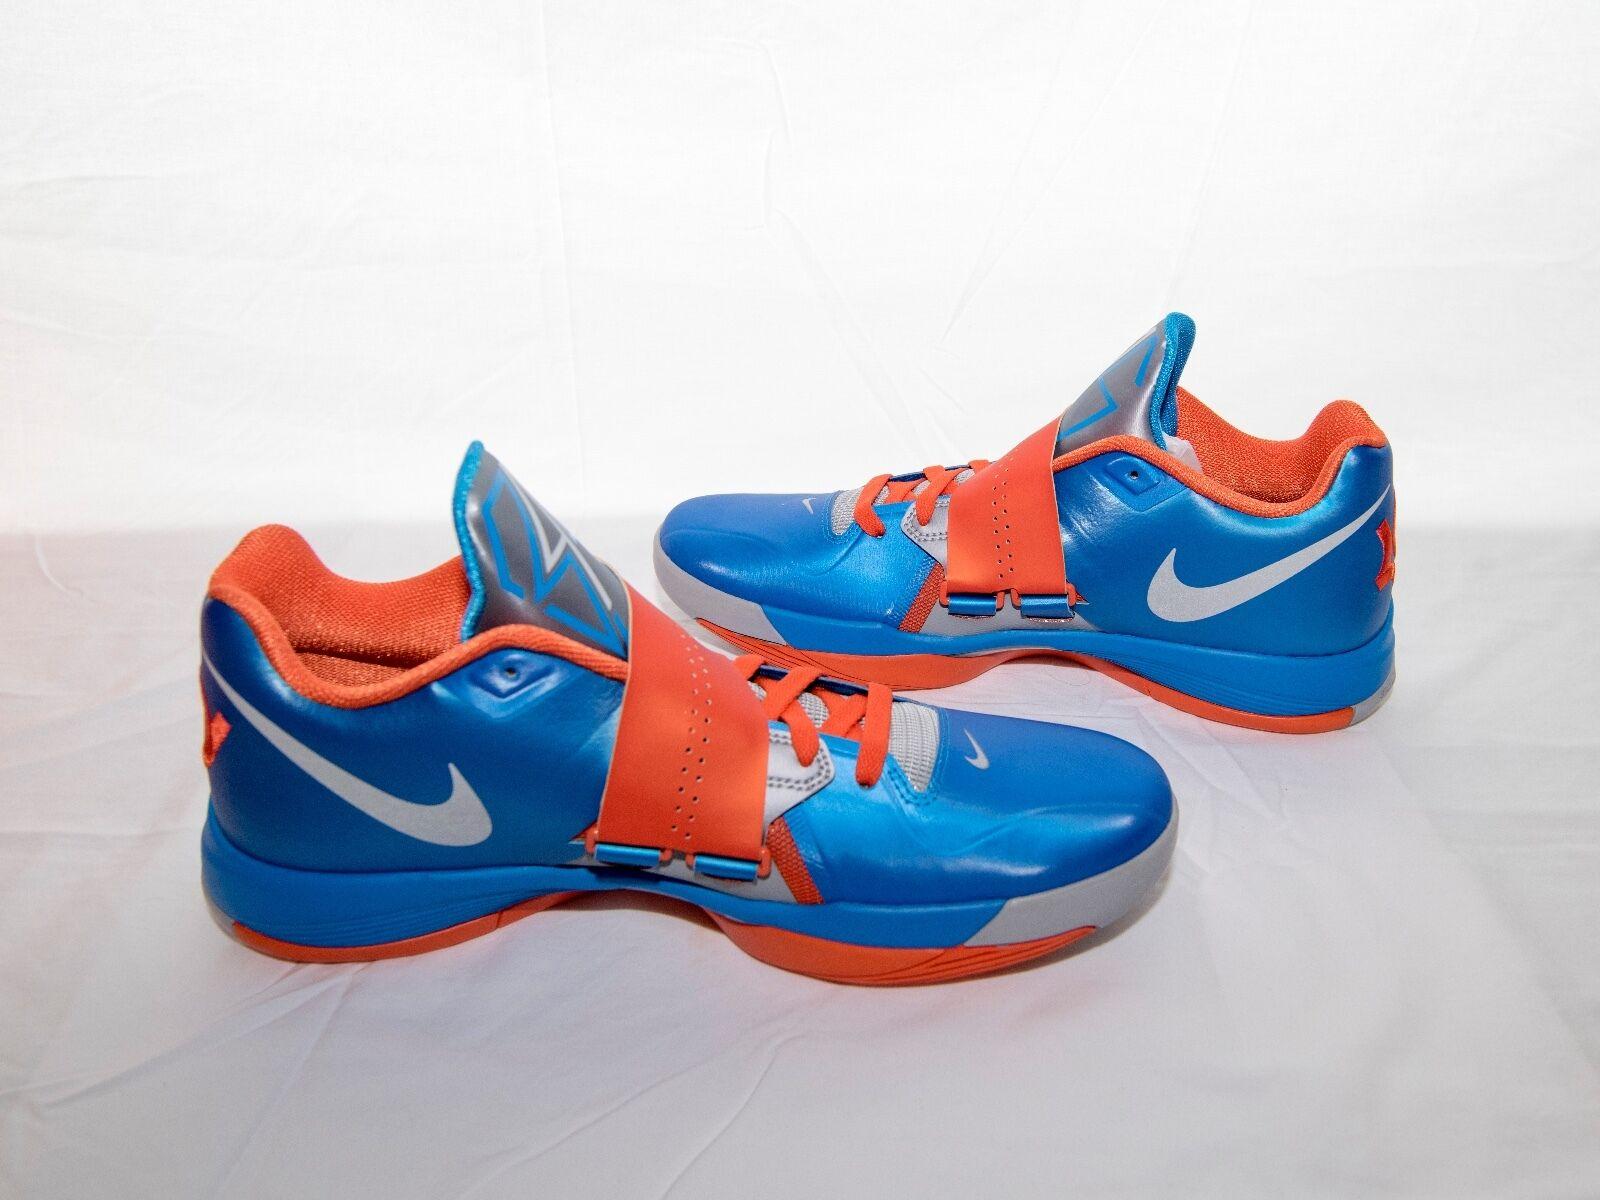 New Nike Zoom KD IV 4 Promo Unreleased color PHTblue BOM ID 308715 Size 12.5 OGB